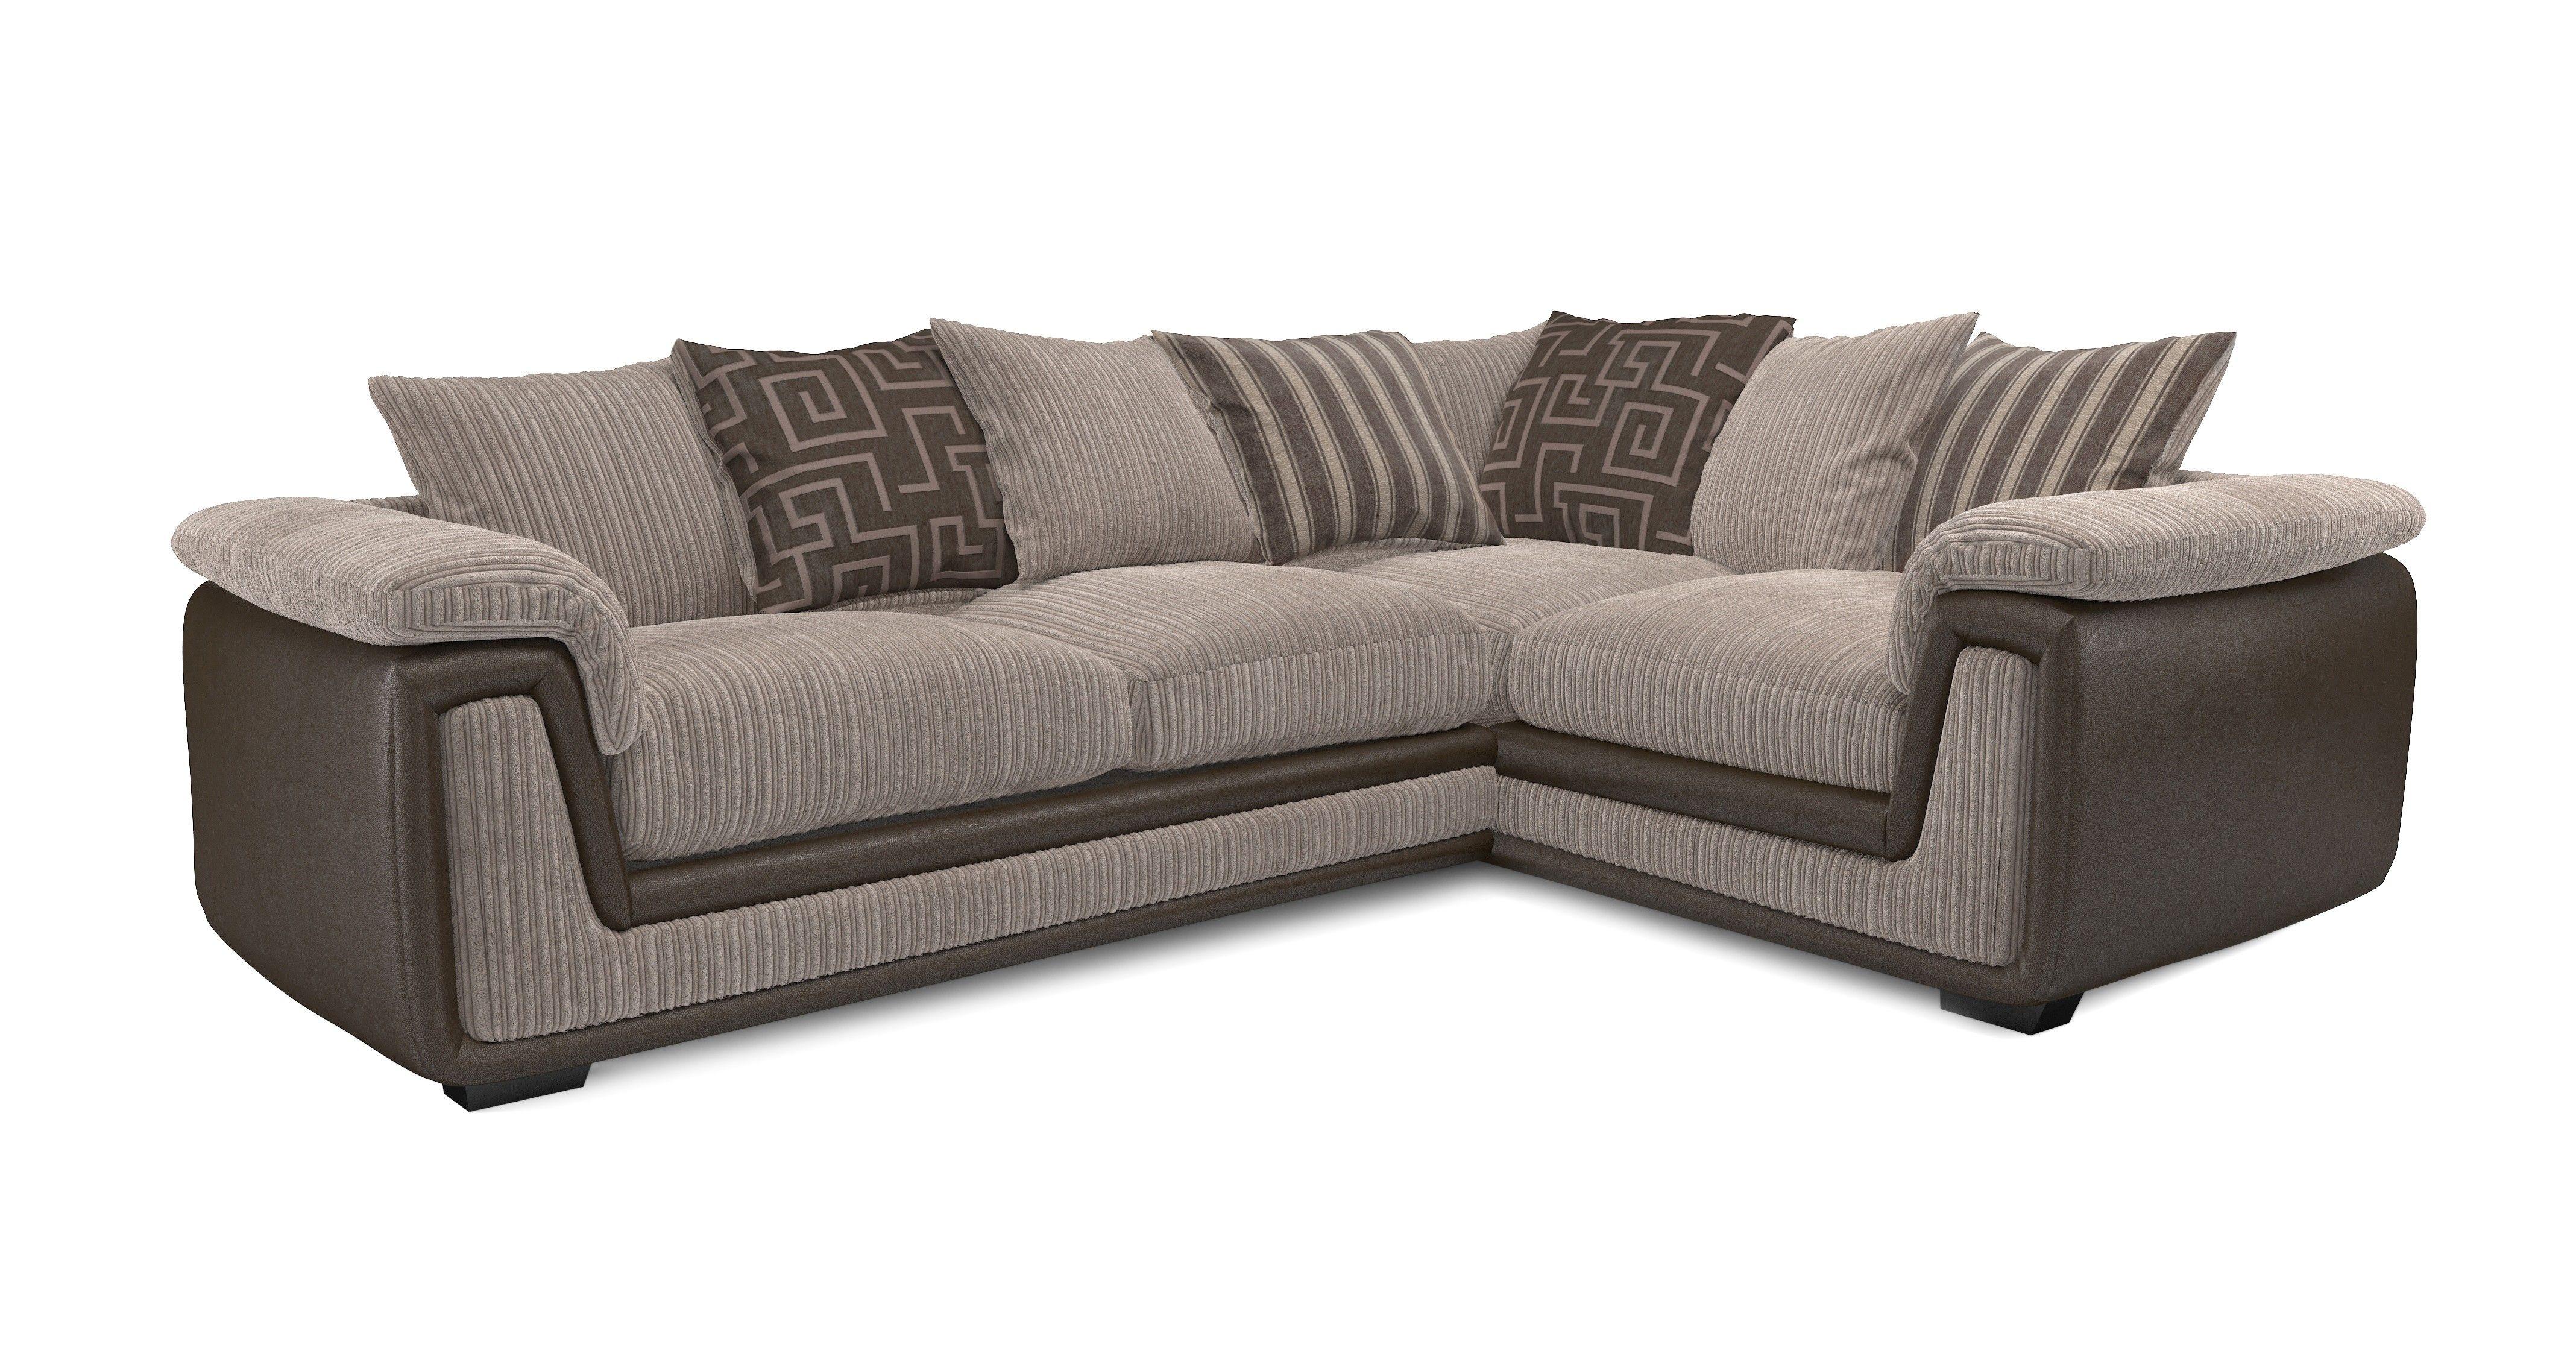 Samson Left Hand Facing 2 Seater Corner Sofa DFS